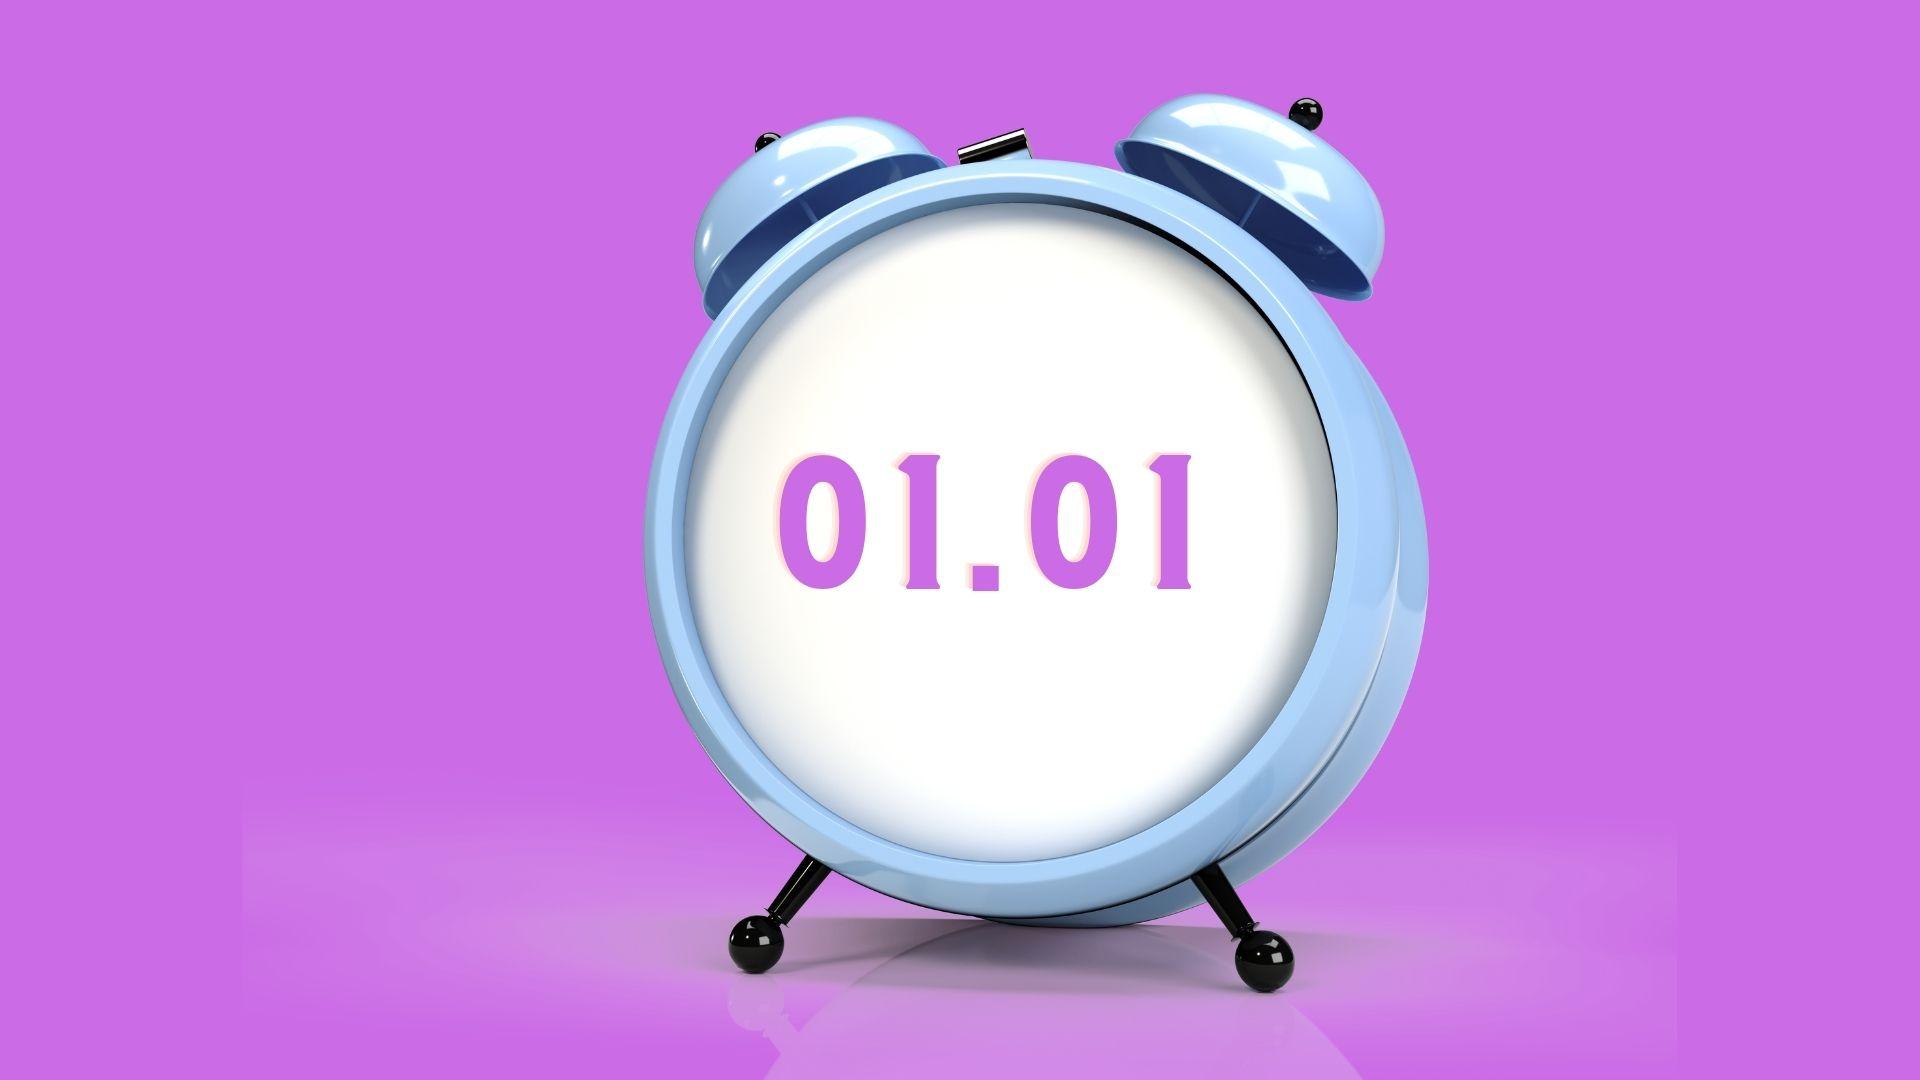 01.01 Saat Anlamı